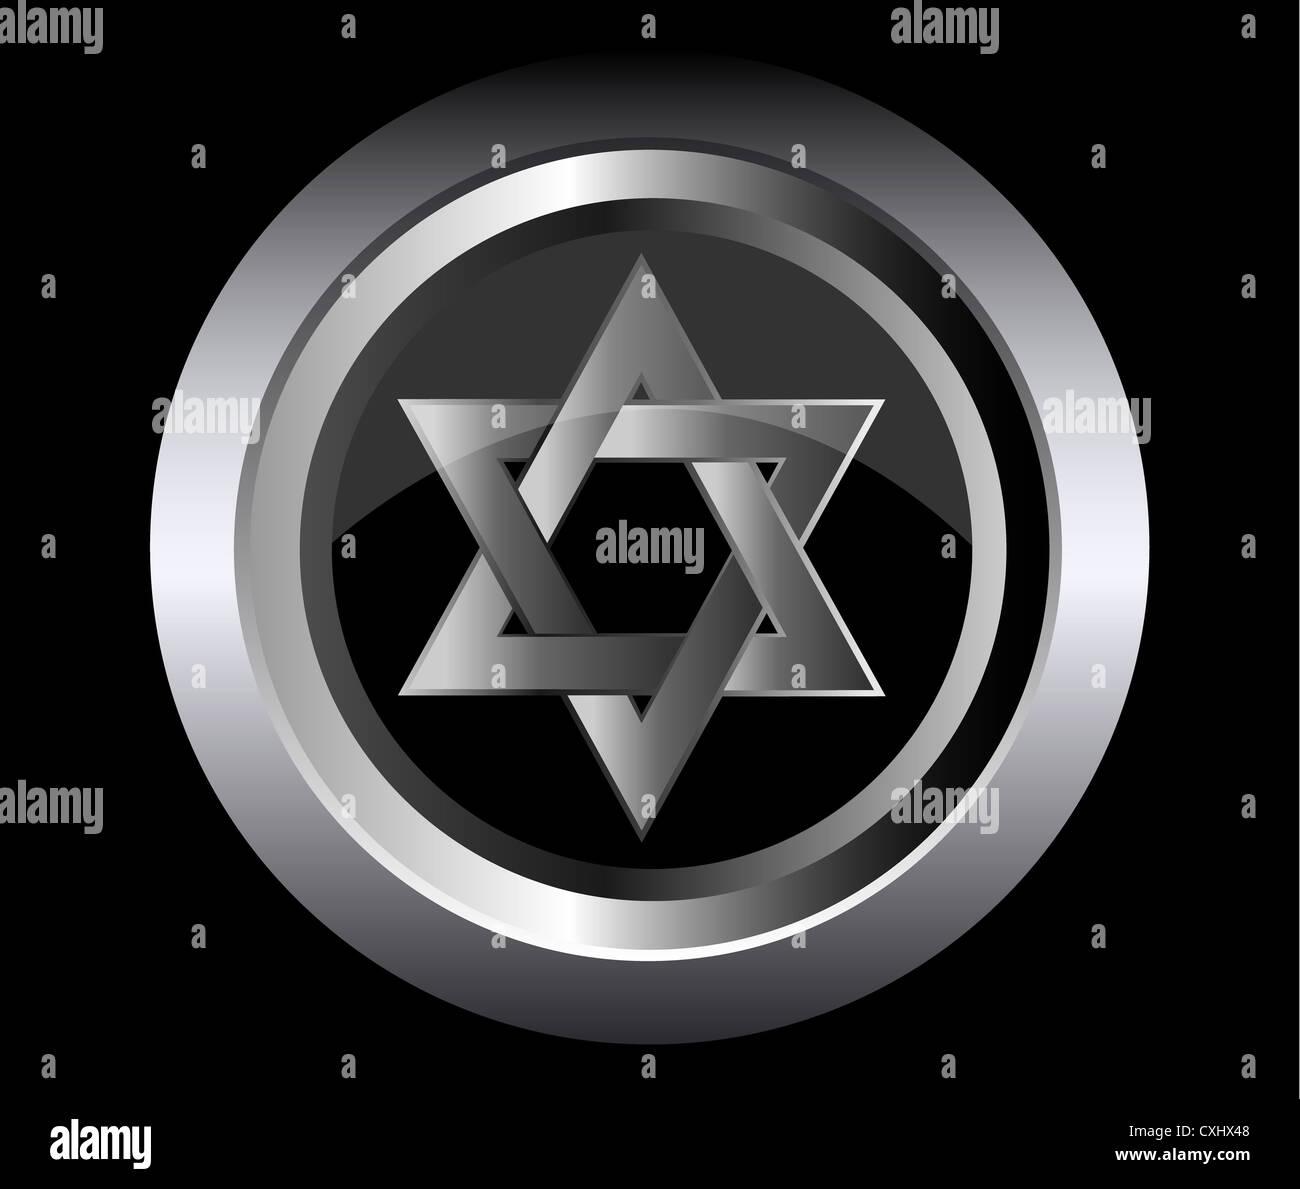 hebrew Jewish Star of magen david in black metal button vector illustration - Stock Image